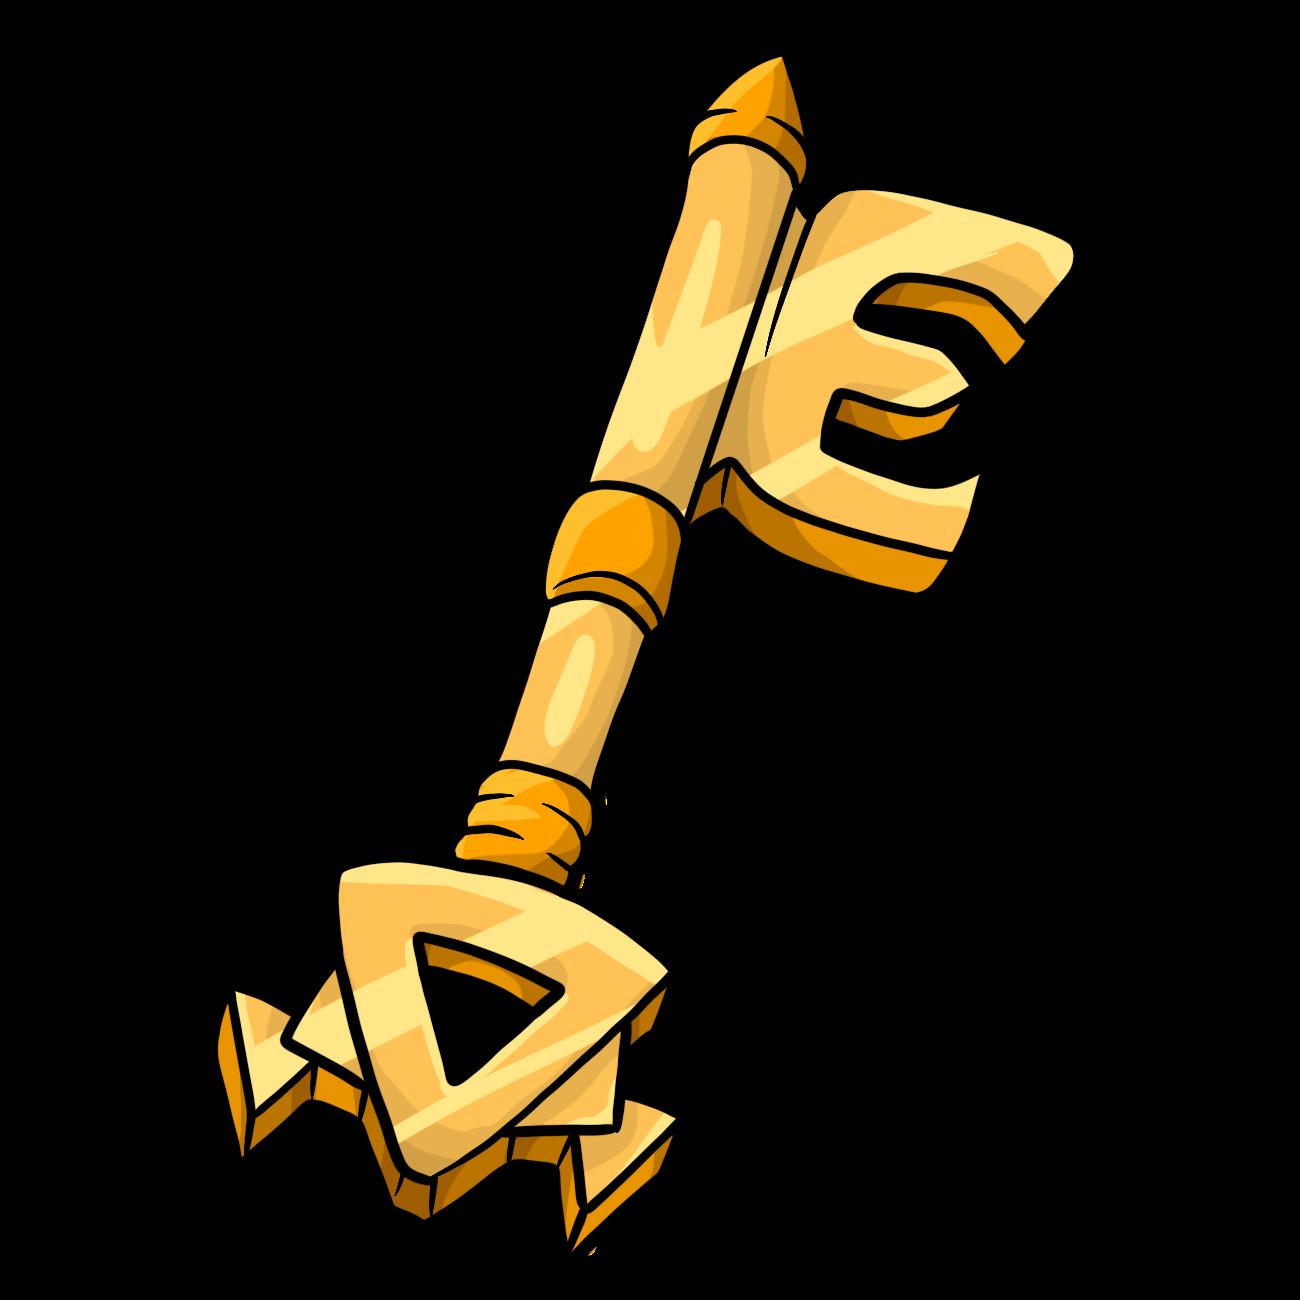 x1 Legendary Key